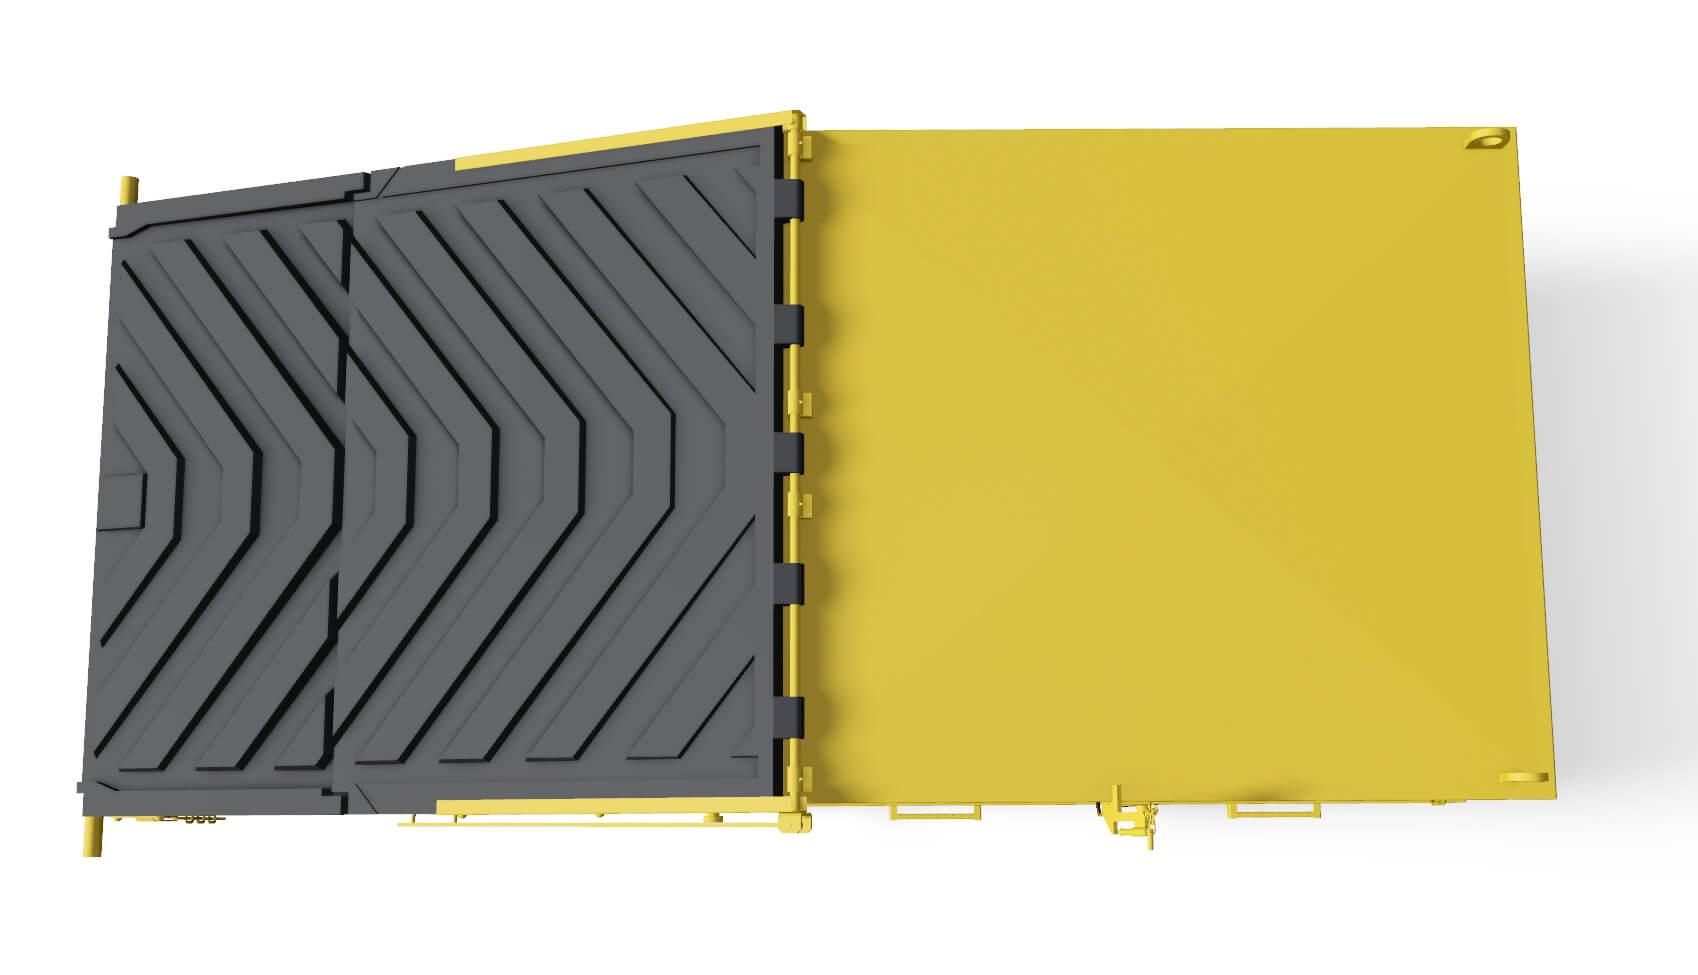 KB-TPV 10 C ovan